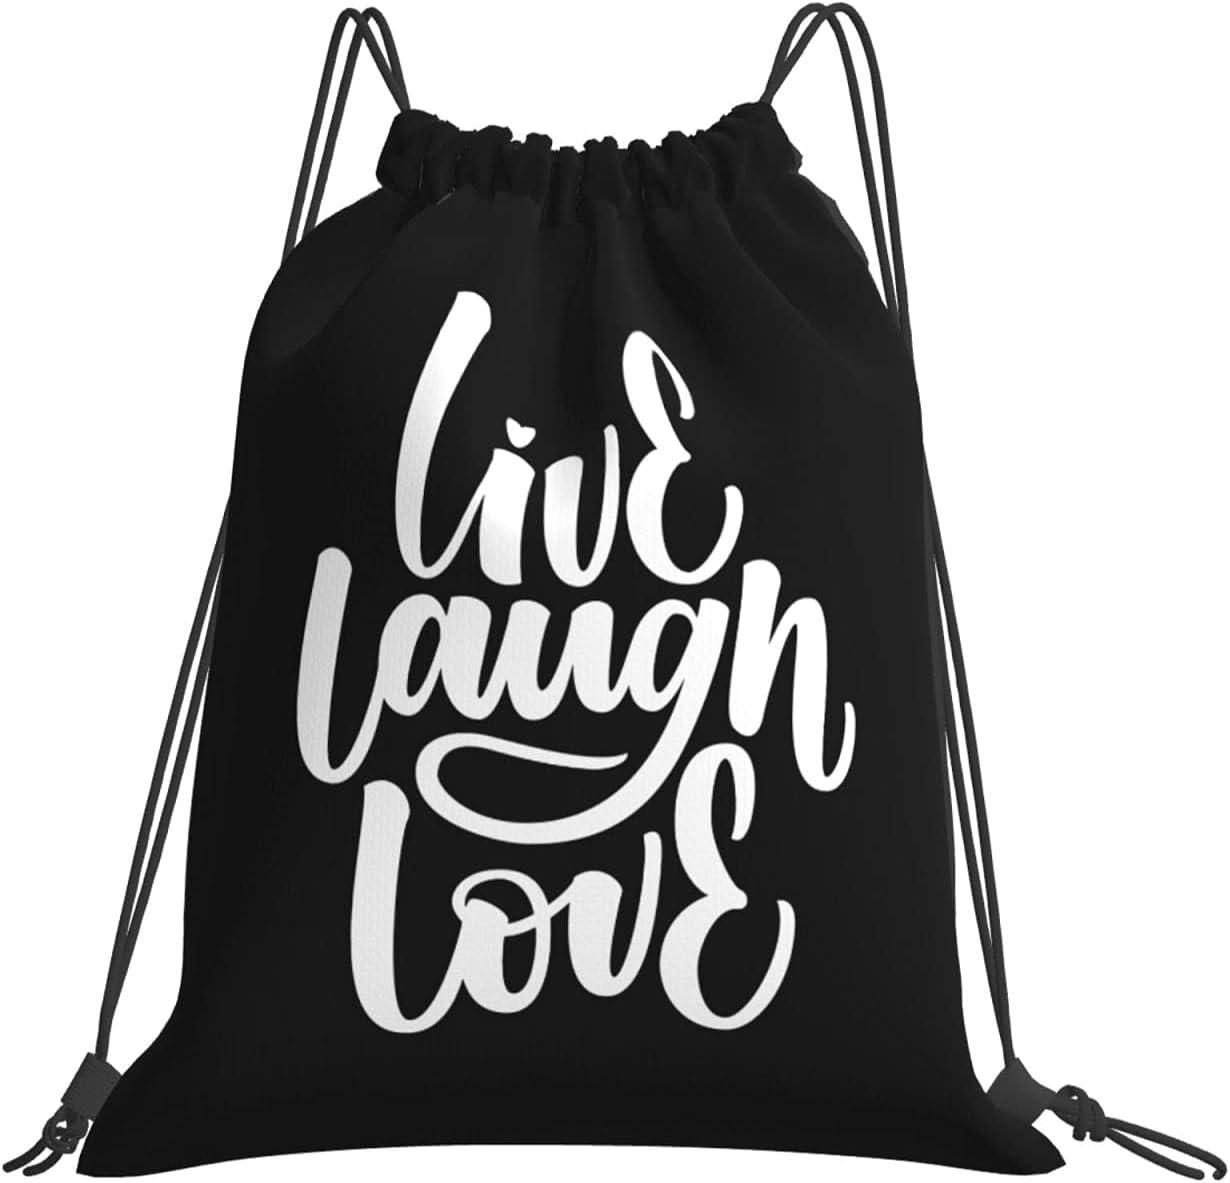 Live Laugh Love Drawstring Austin Mall Backpack Sackpack String Sports New item G Bag